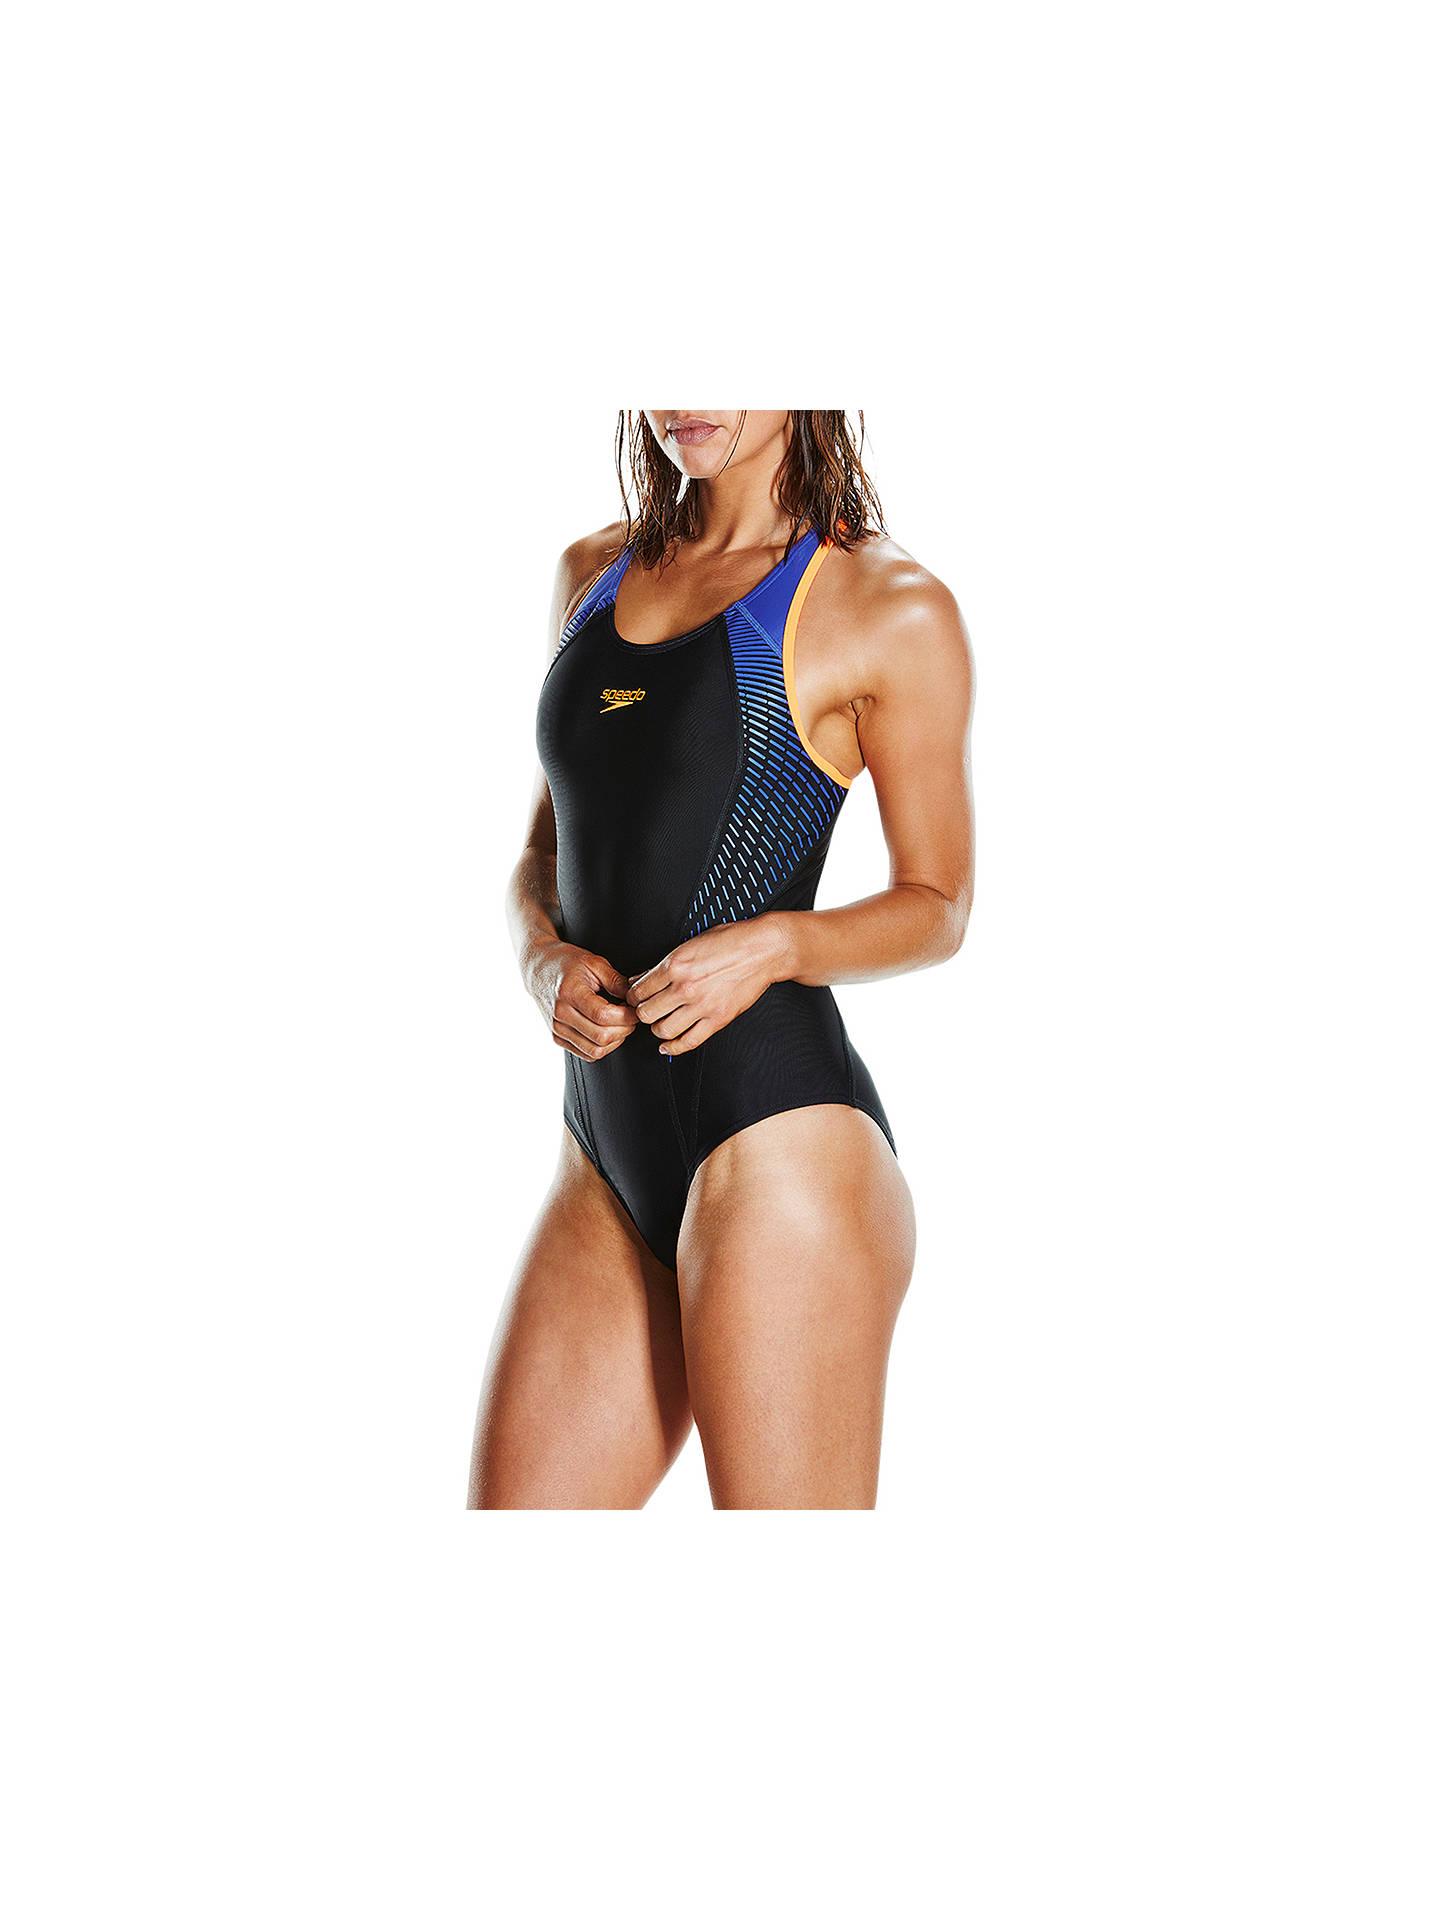 ea6691f1d6 Buy Speedo Fit Laneback Swimsuit, Black/Orange/Ultramarine, 32 Online at  johnlewis ...